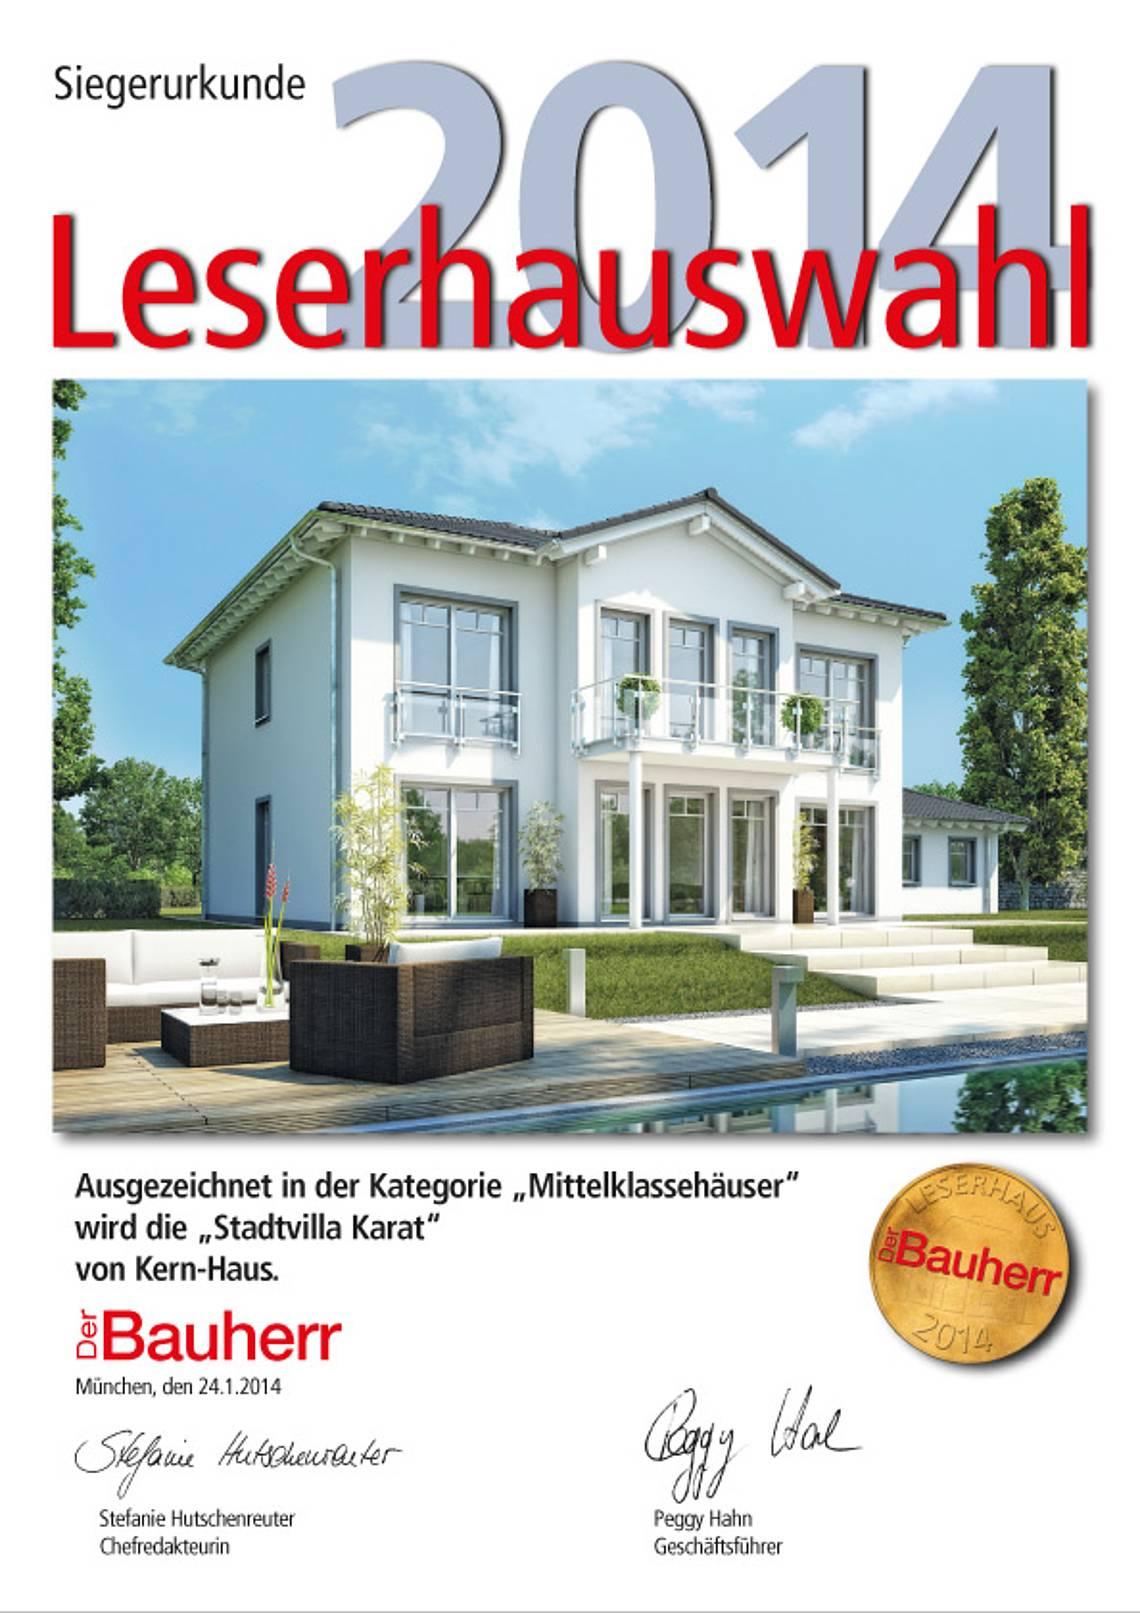 Urkunde Leserhauswahl 2014